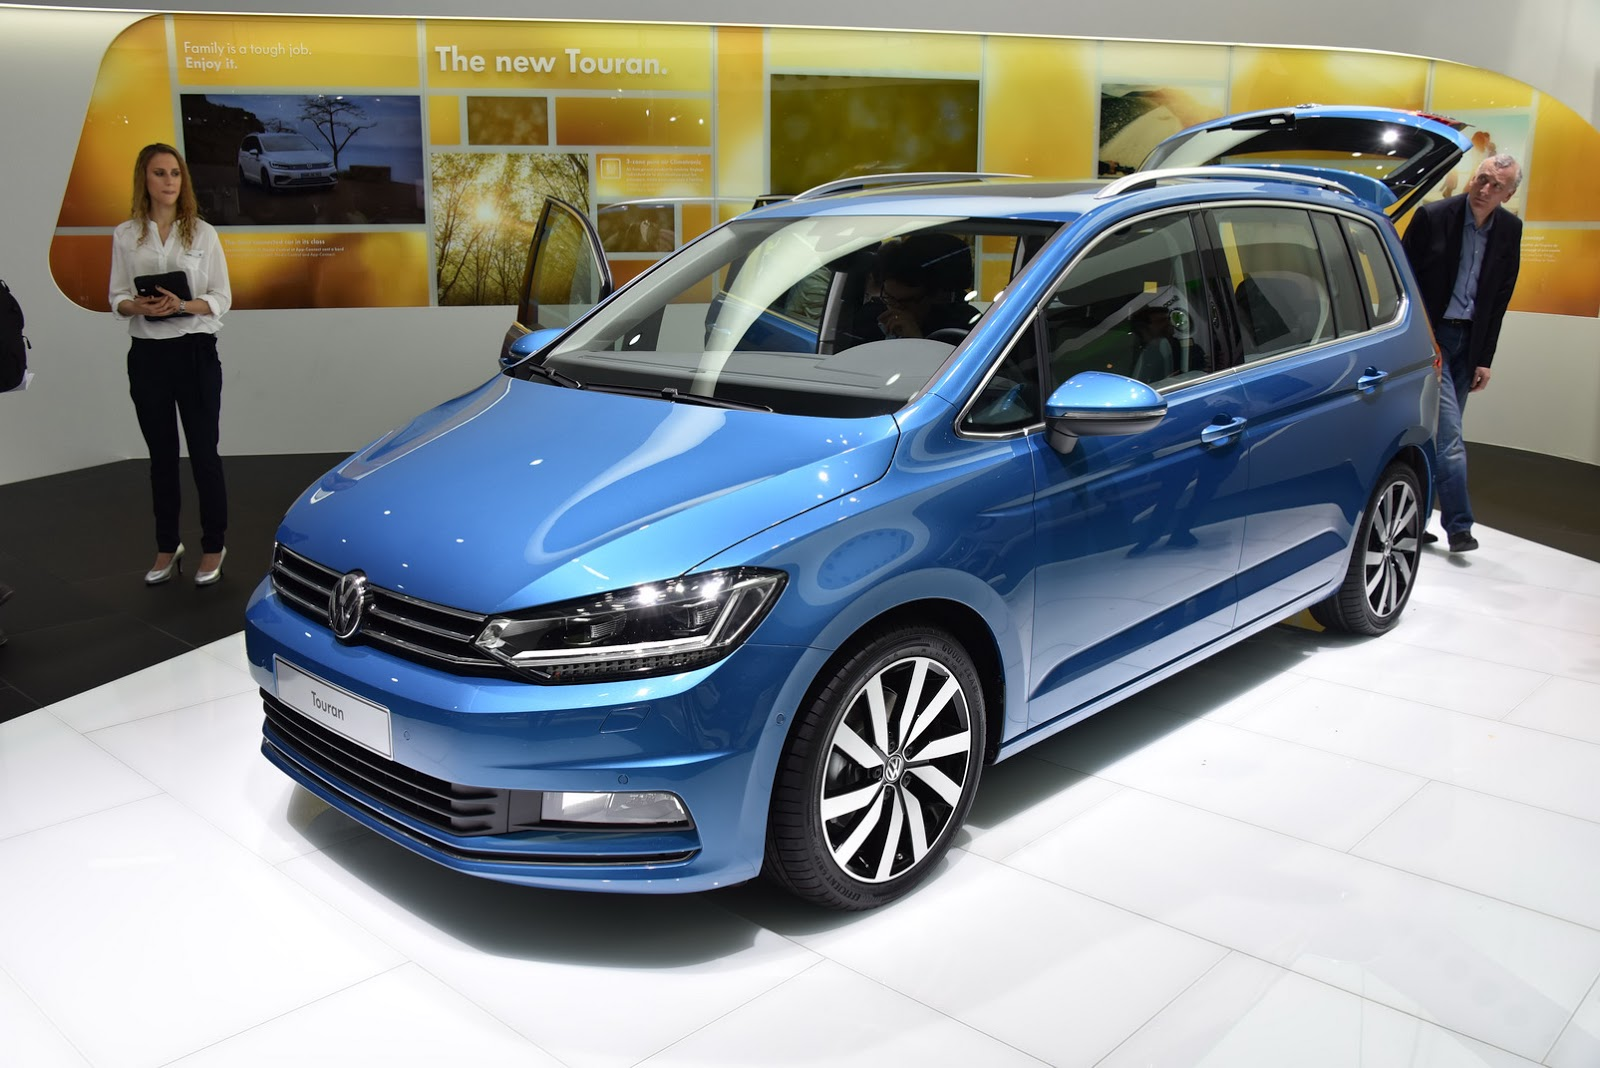 Categories Galleries Geneva Motor Show New Cars VW VW Touran